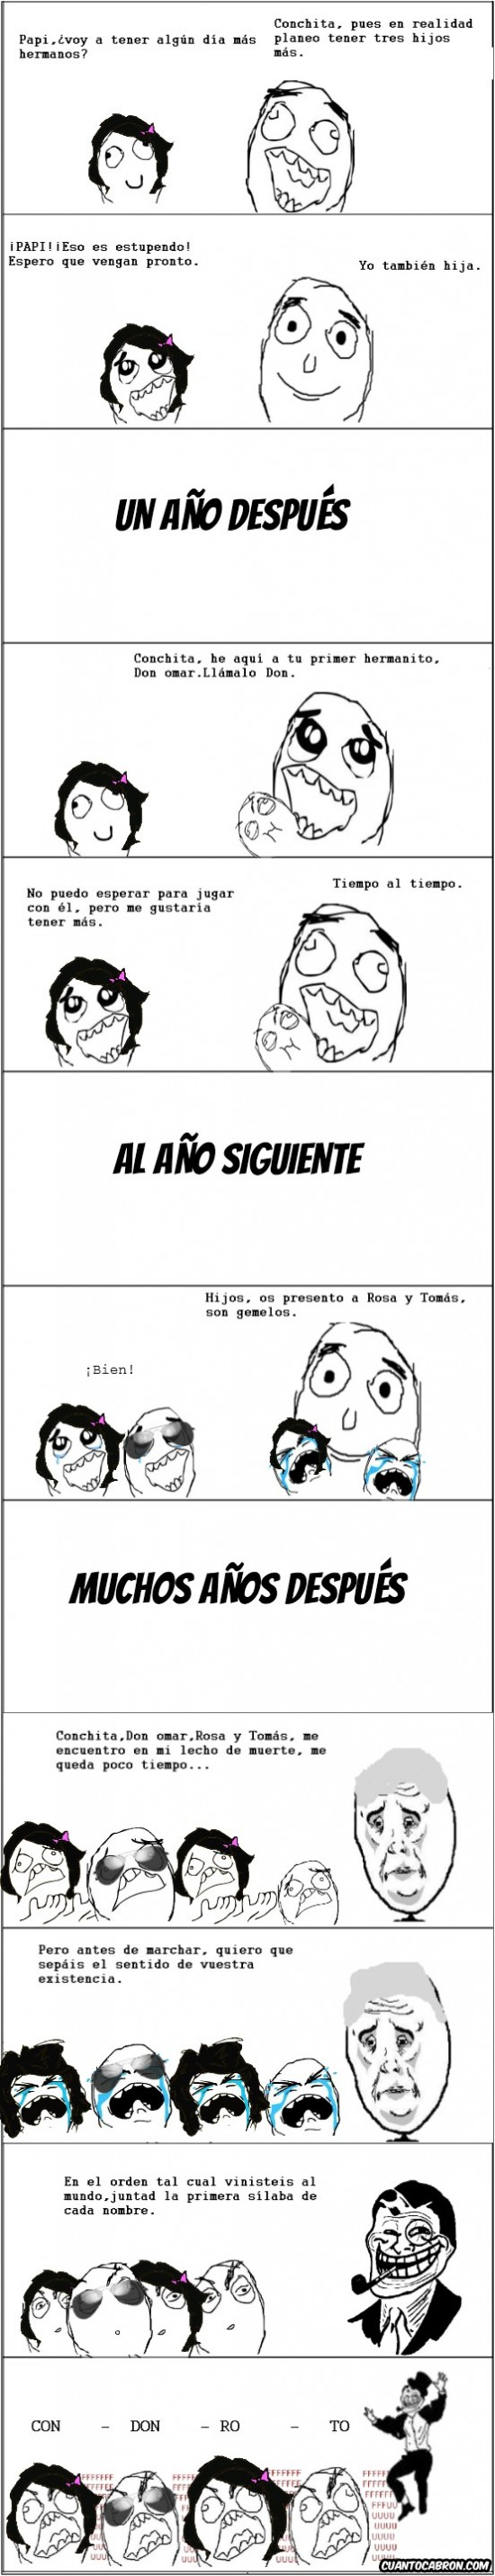 conchita,condon,don omar,padre,roto,troll